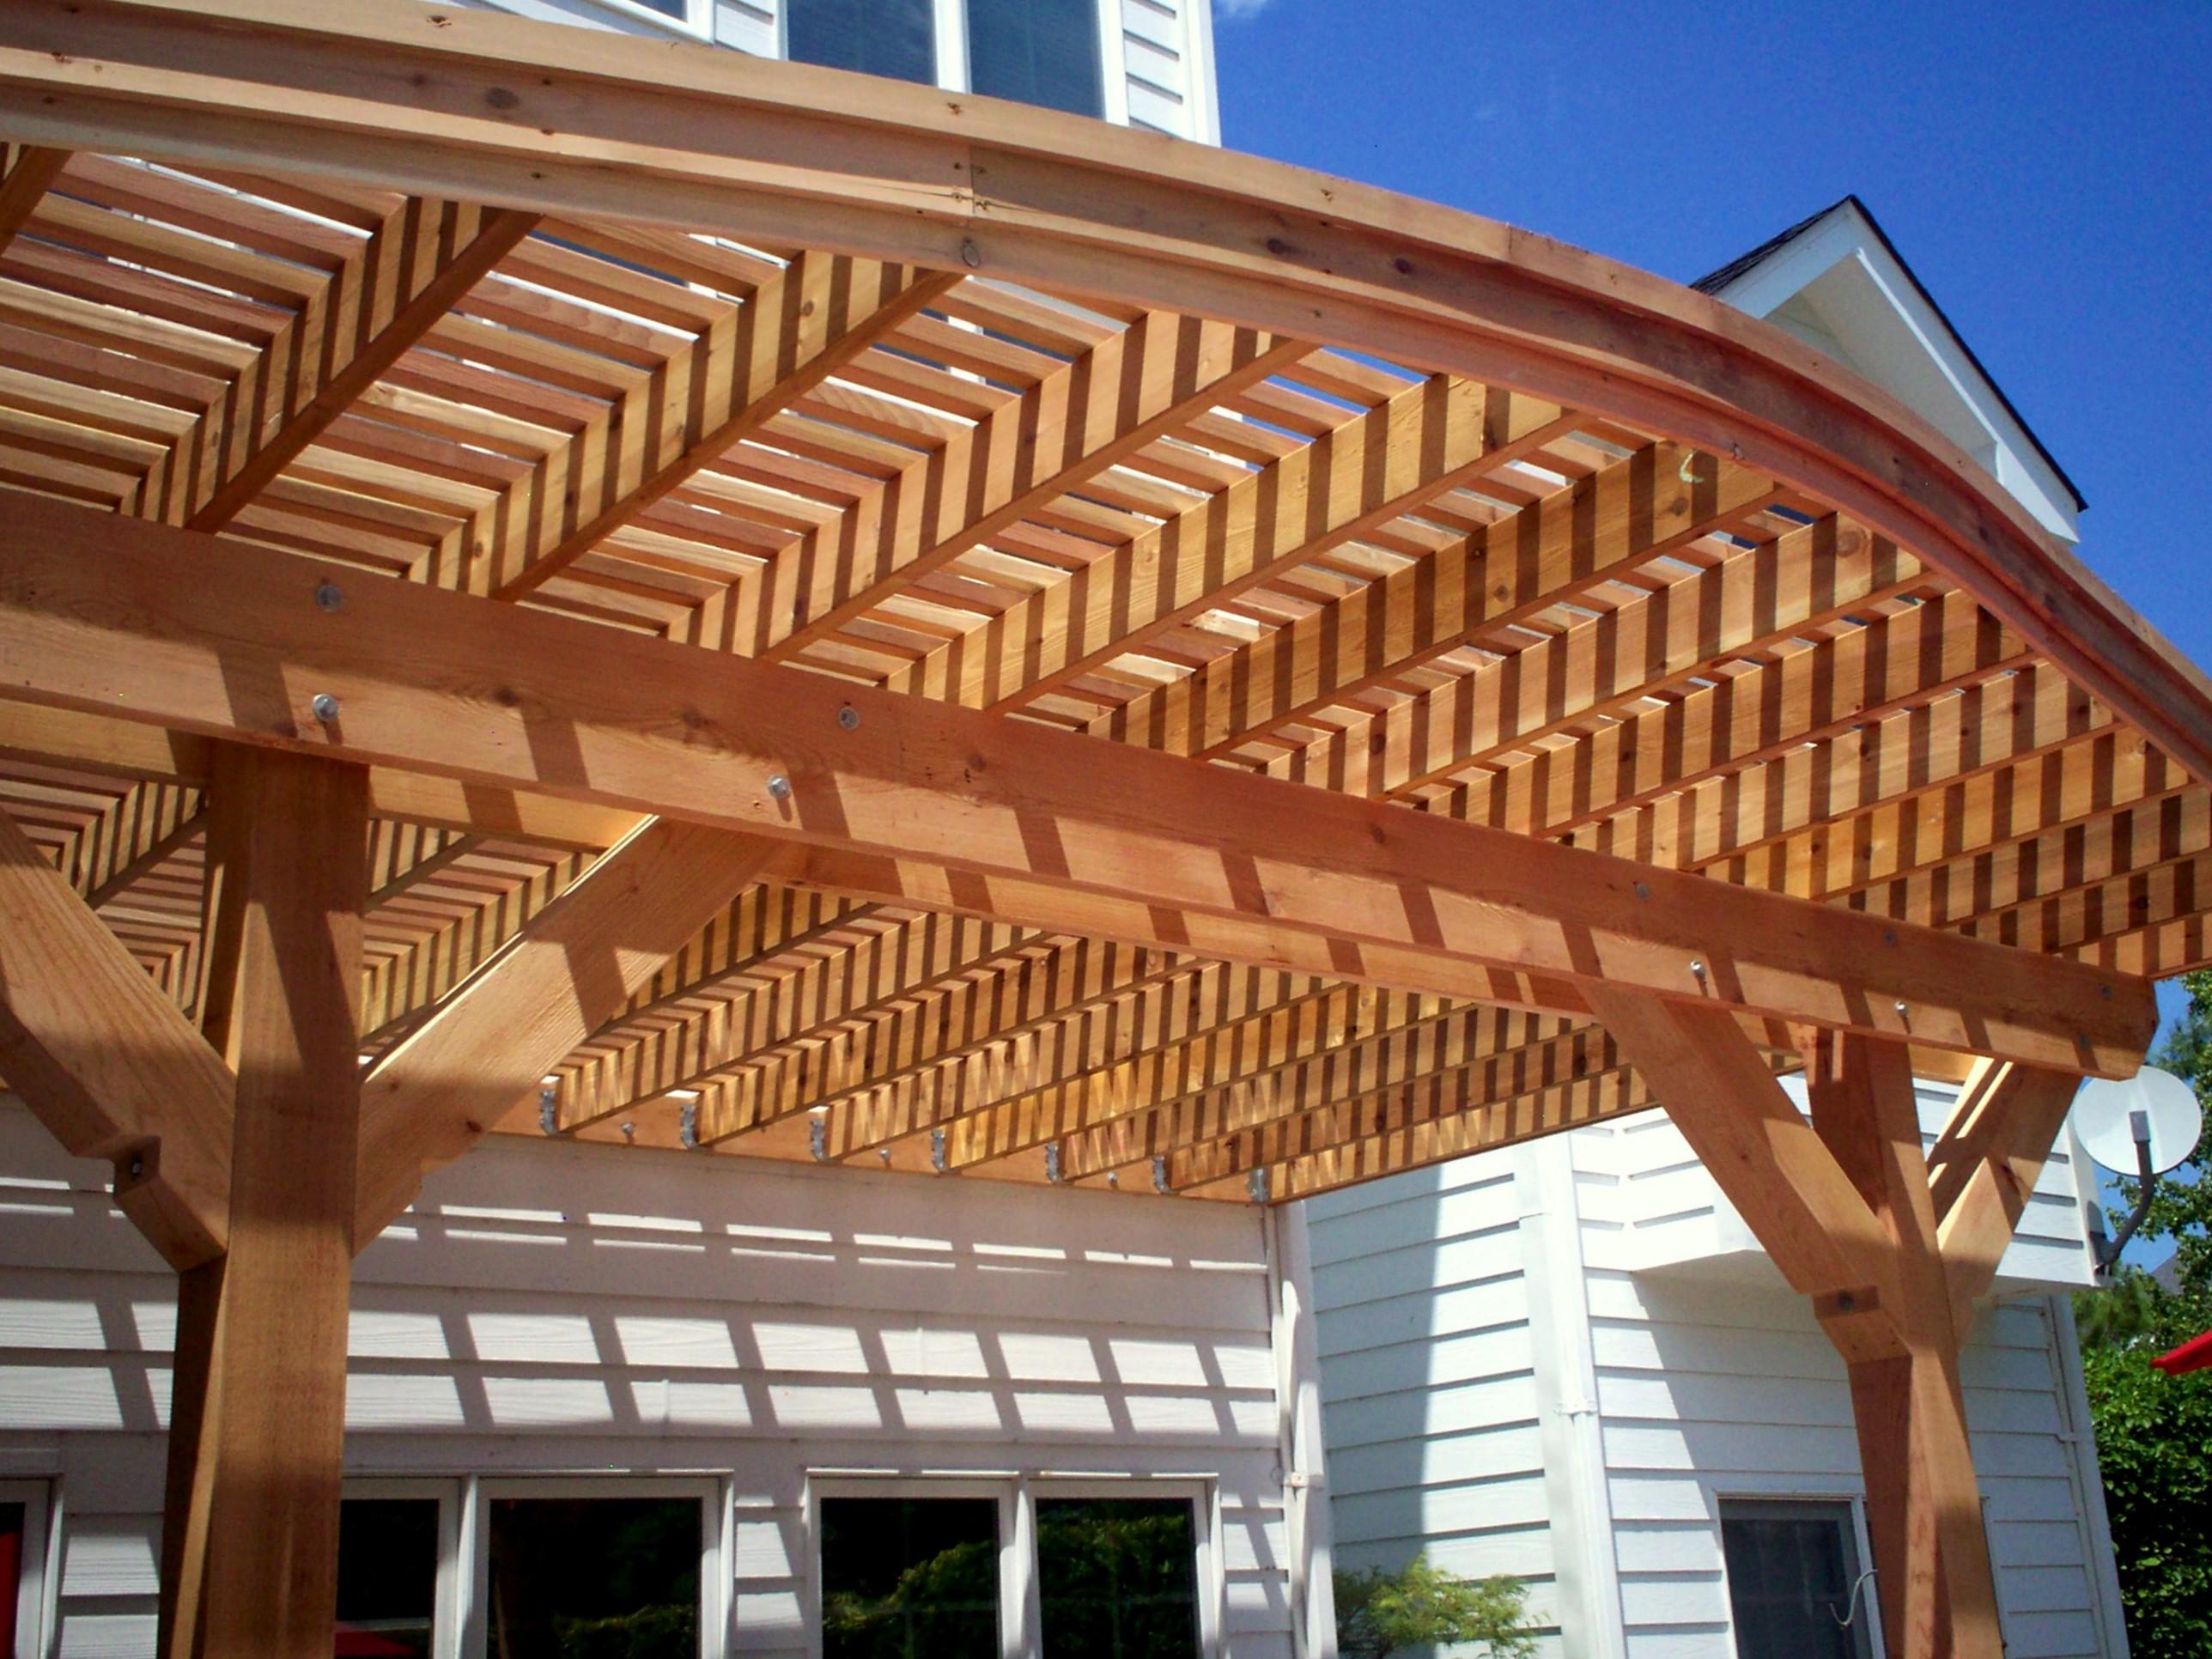 DIY Curved Pergola Design Plans Wooden PDF storage bench plans ...